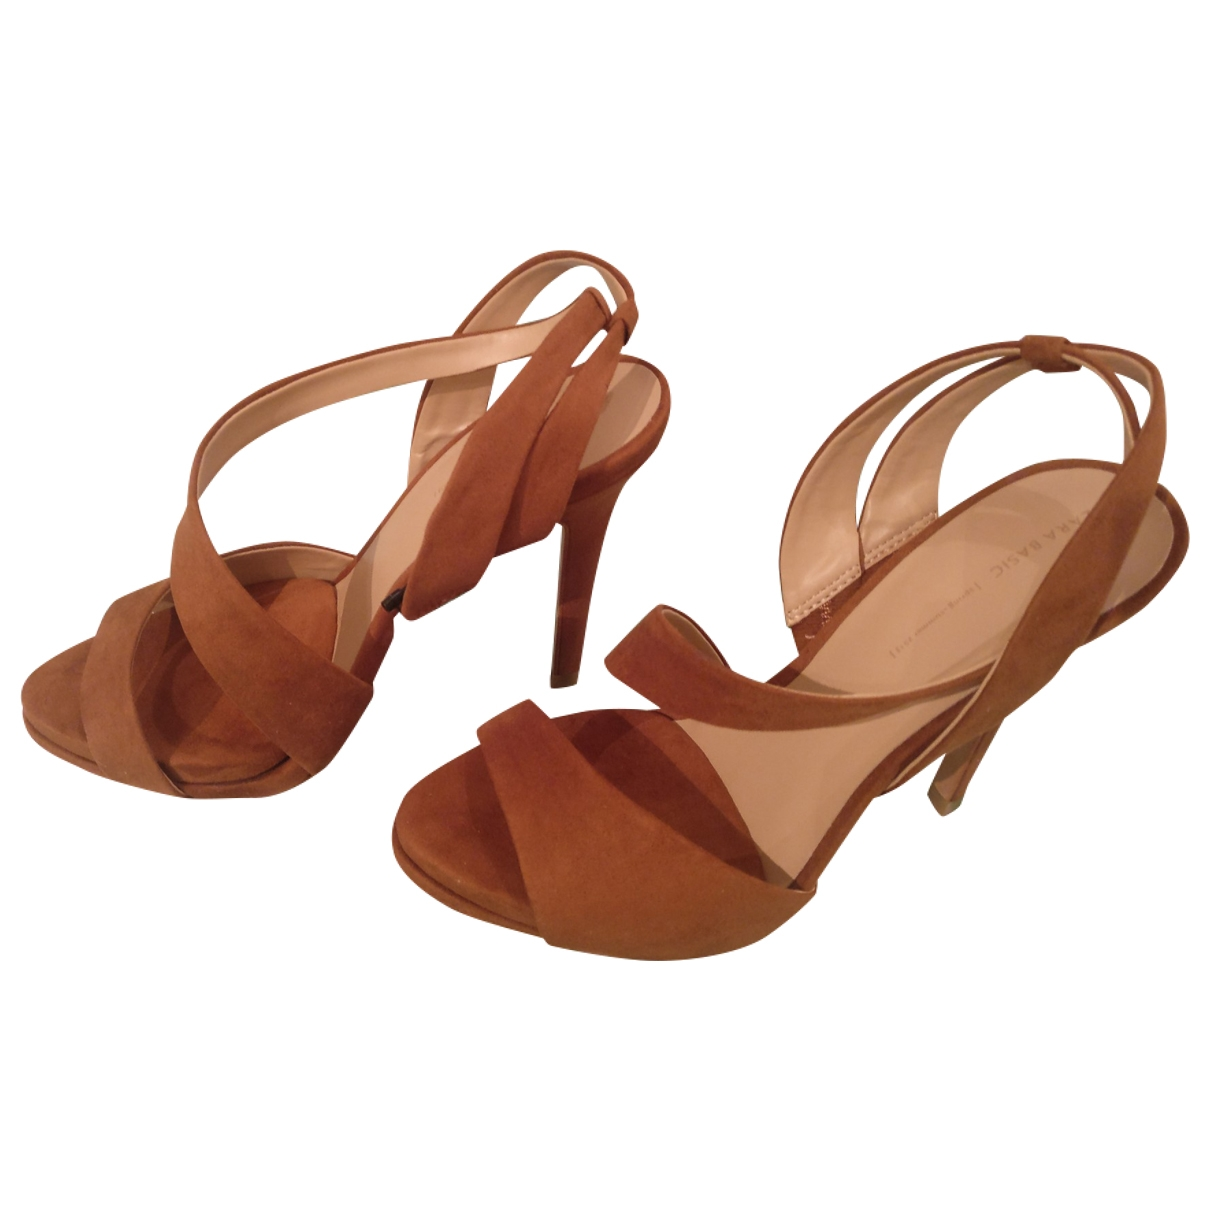 Zara - Sandales   pour femme en suede - camel